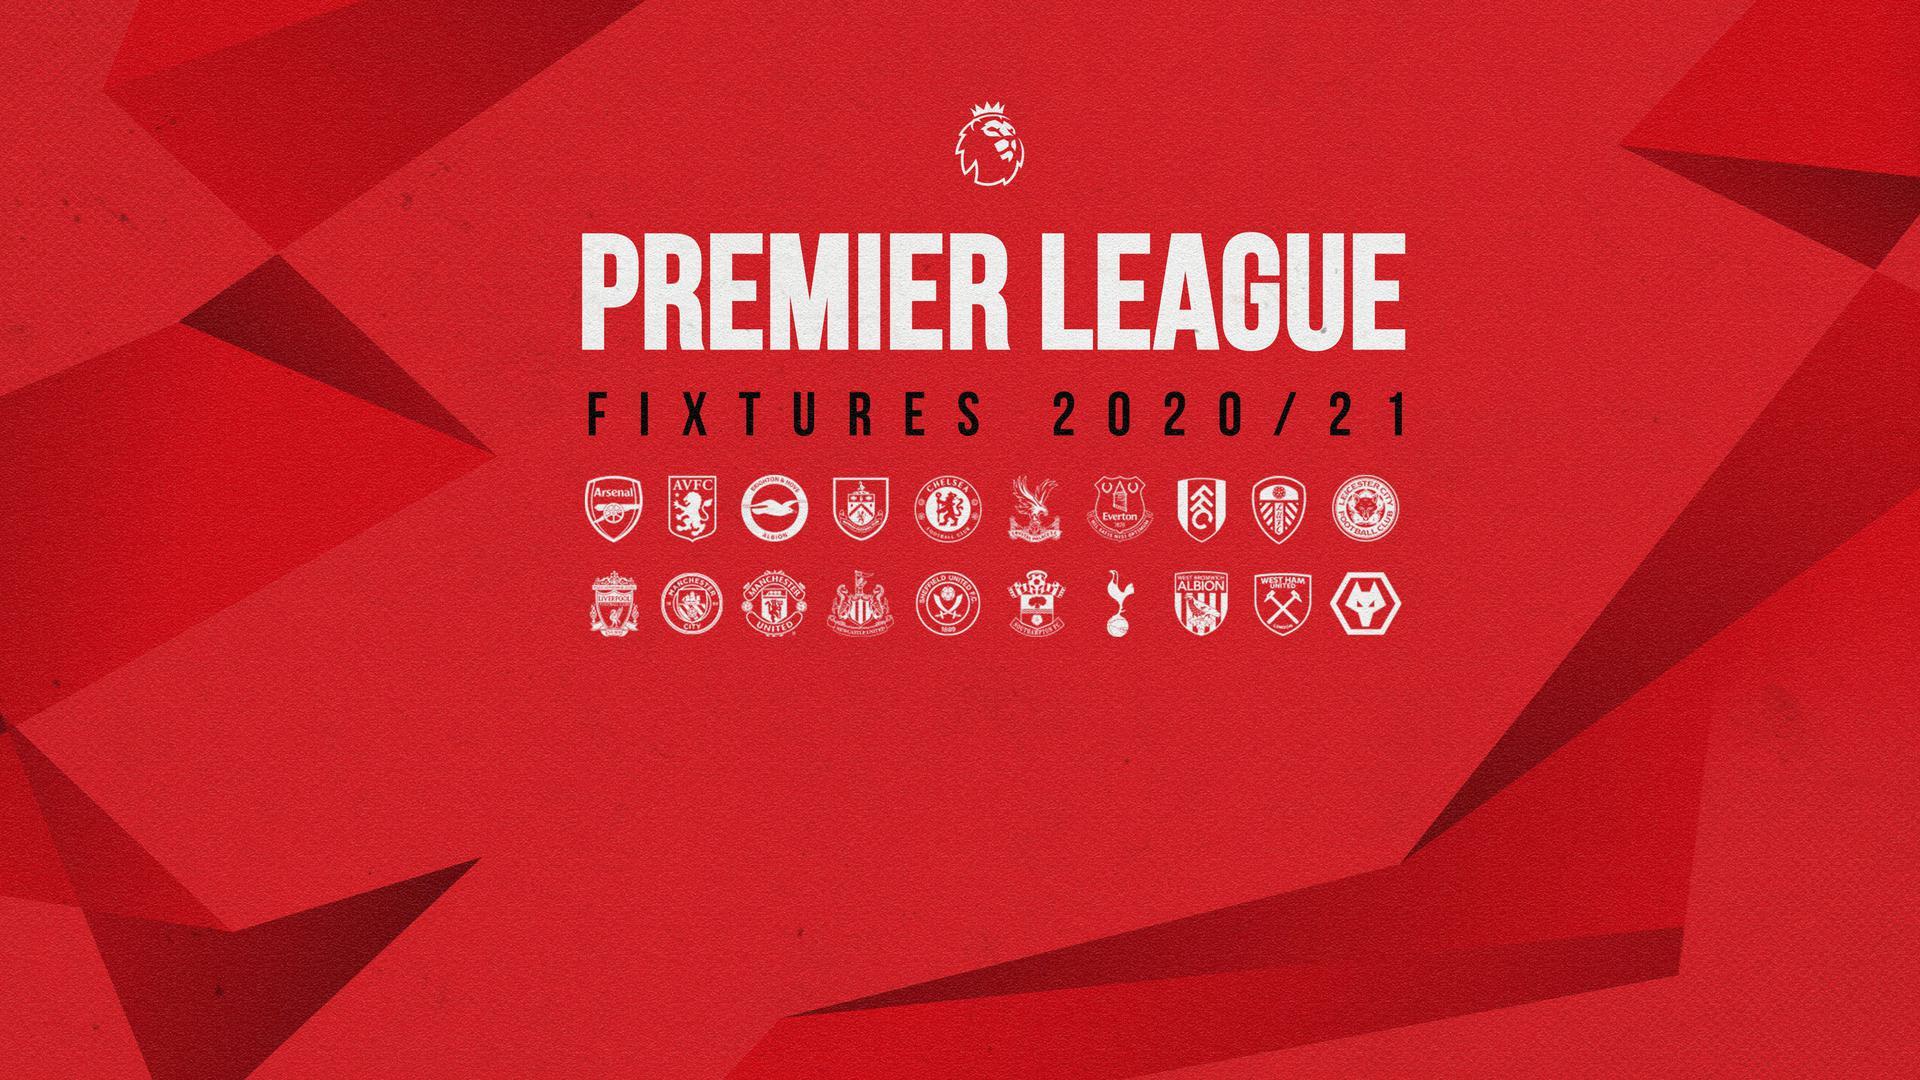 Epl 2020 21 Man Utd Premier League Fixtures Tickets Information Manchester United